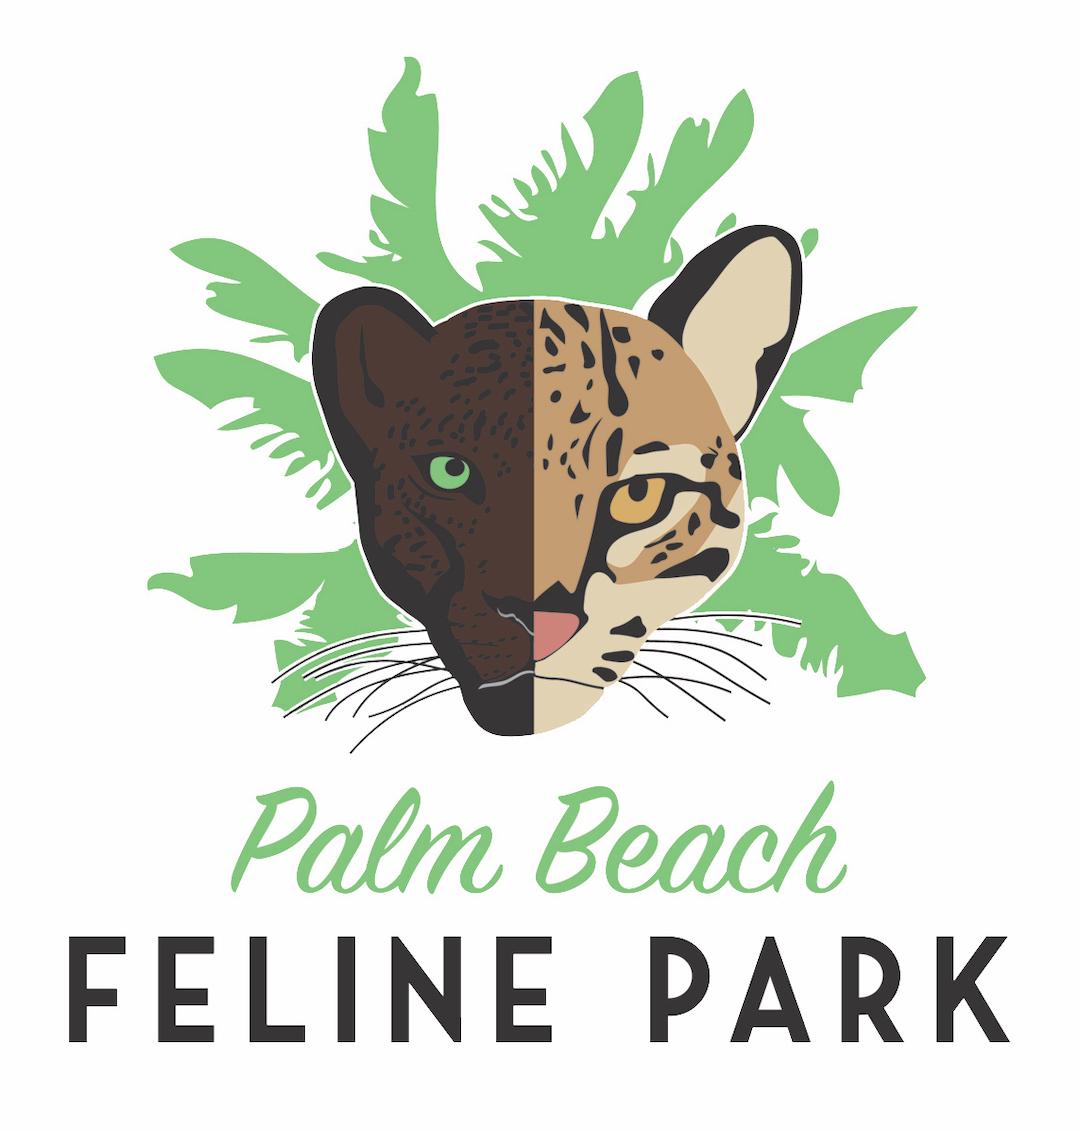 Palm Beach Feline Park Logo Design